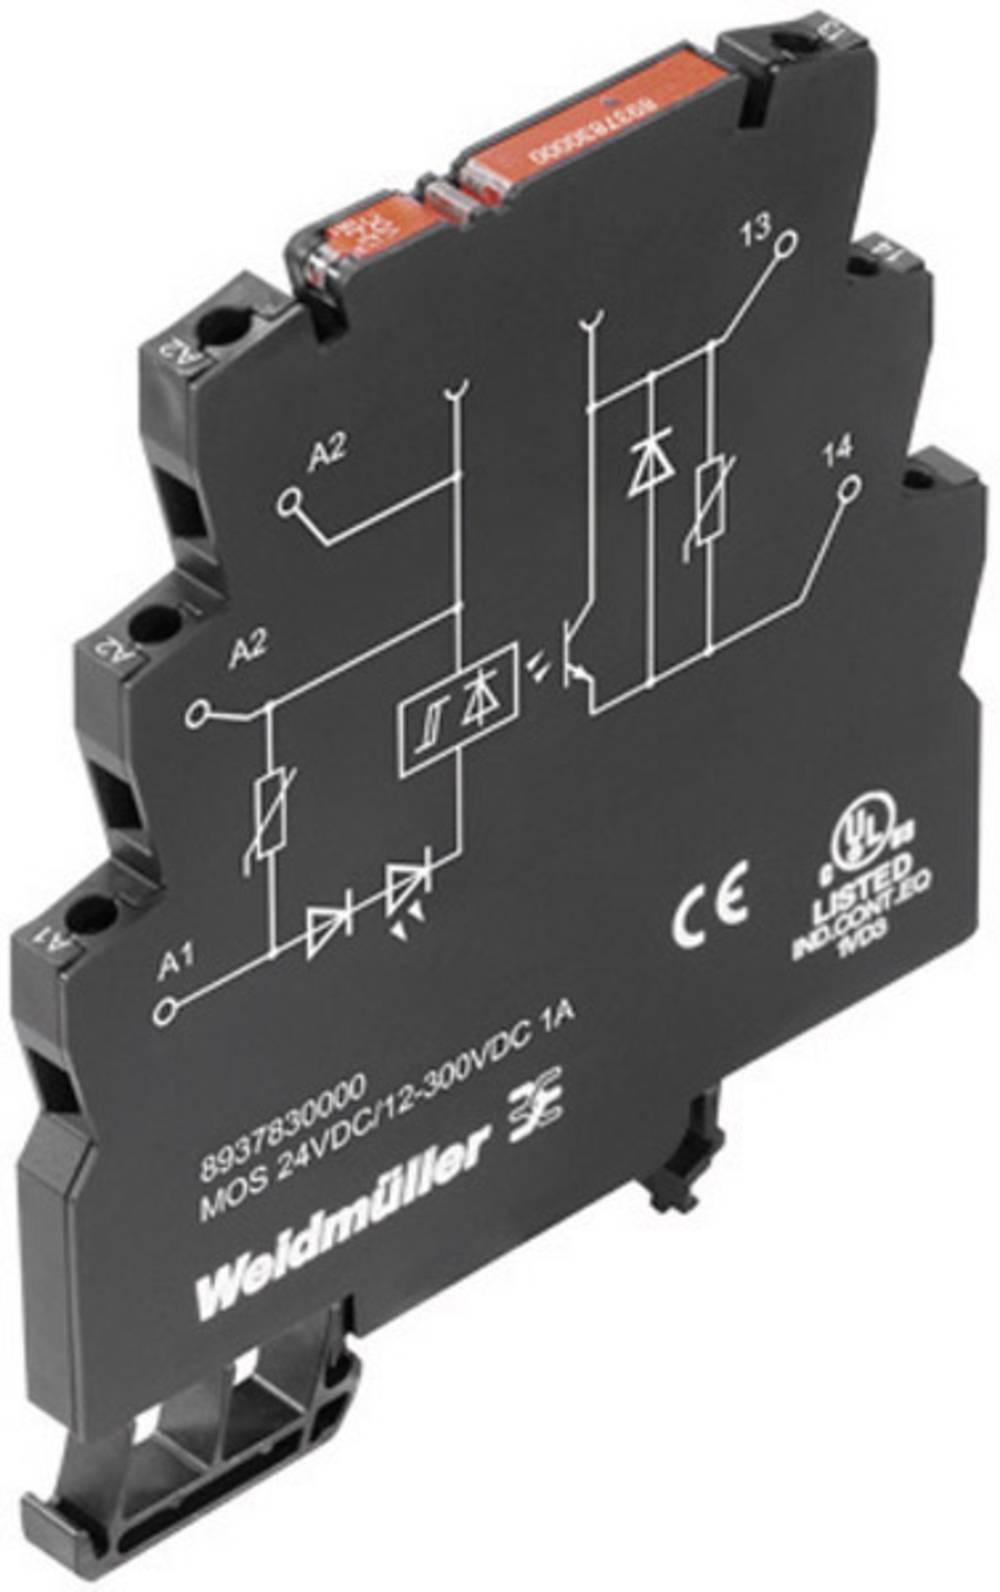 TTL-modul Weidmller Microopto, vhodni signal: 12-28 V/DC/0,, vhodni signal: 12-28 V/DC/0, 8937930000